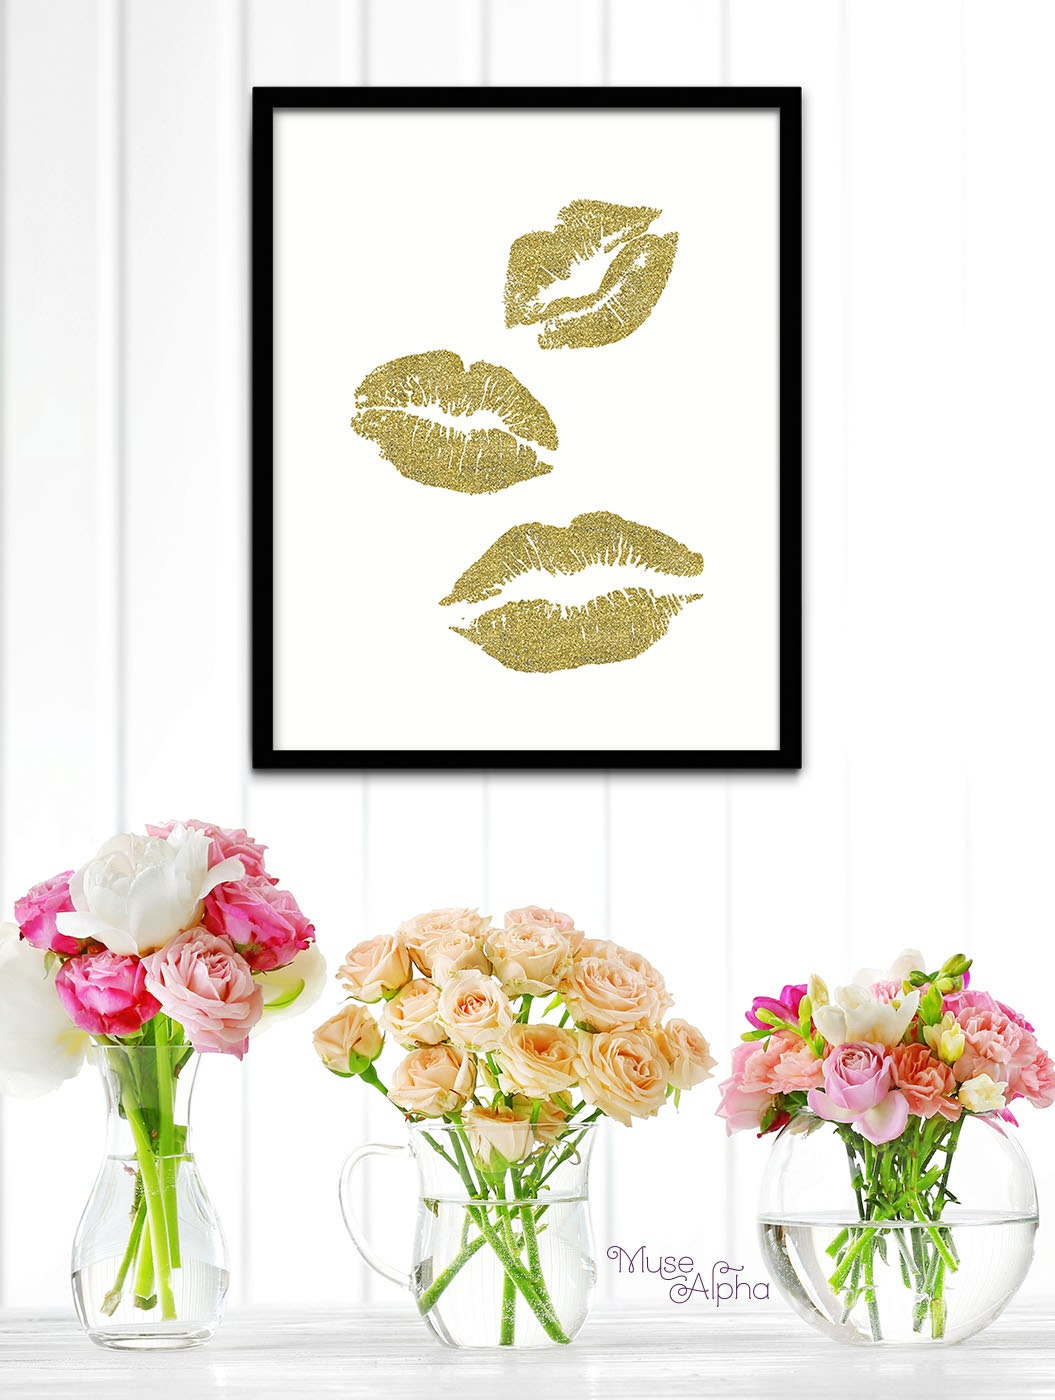 Etsy Gold Wall Decor : Gold art wall decor fashion prints